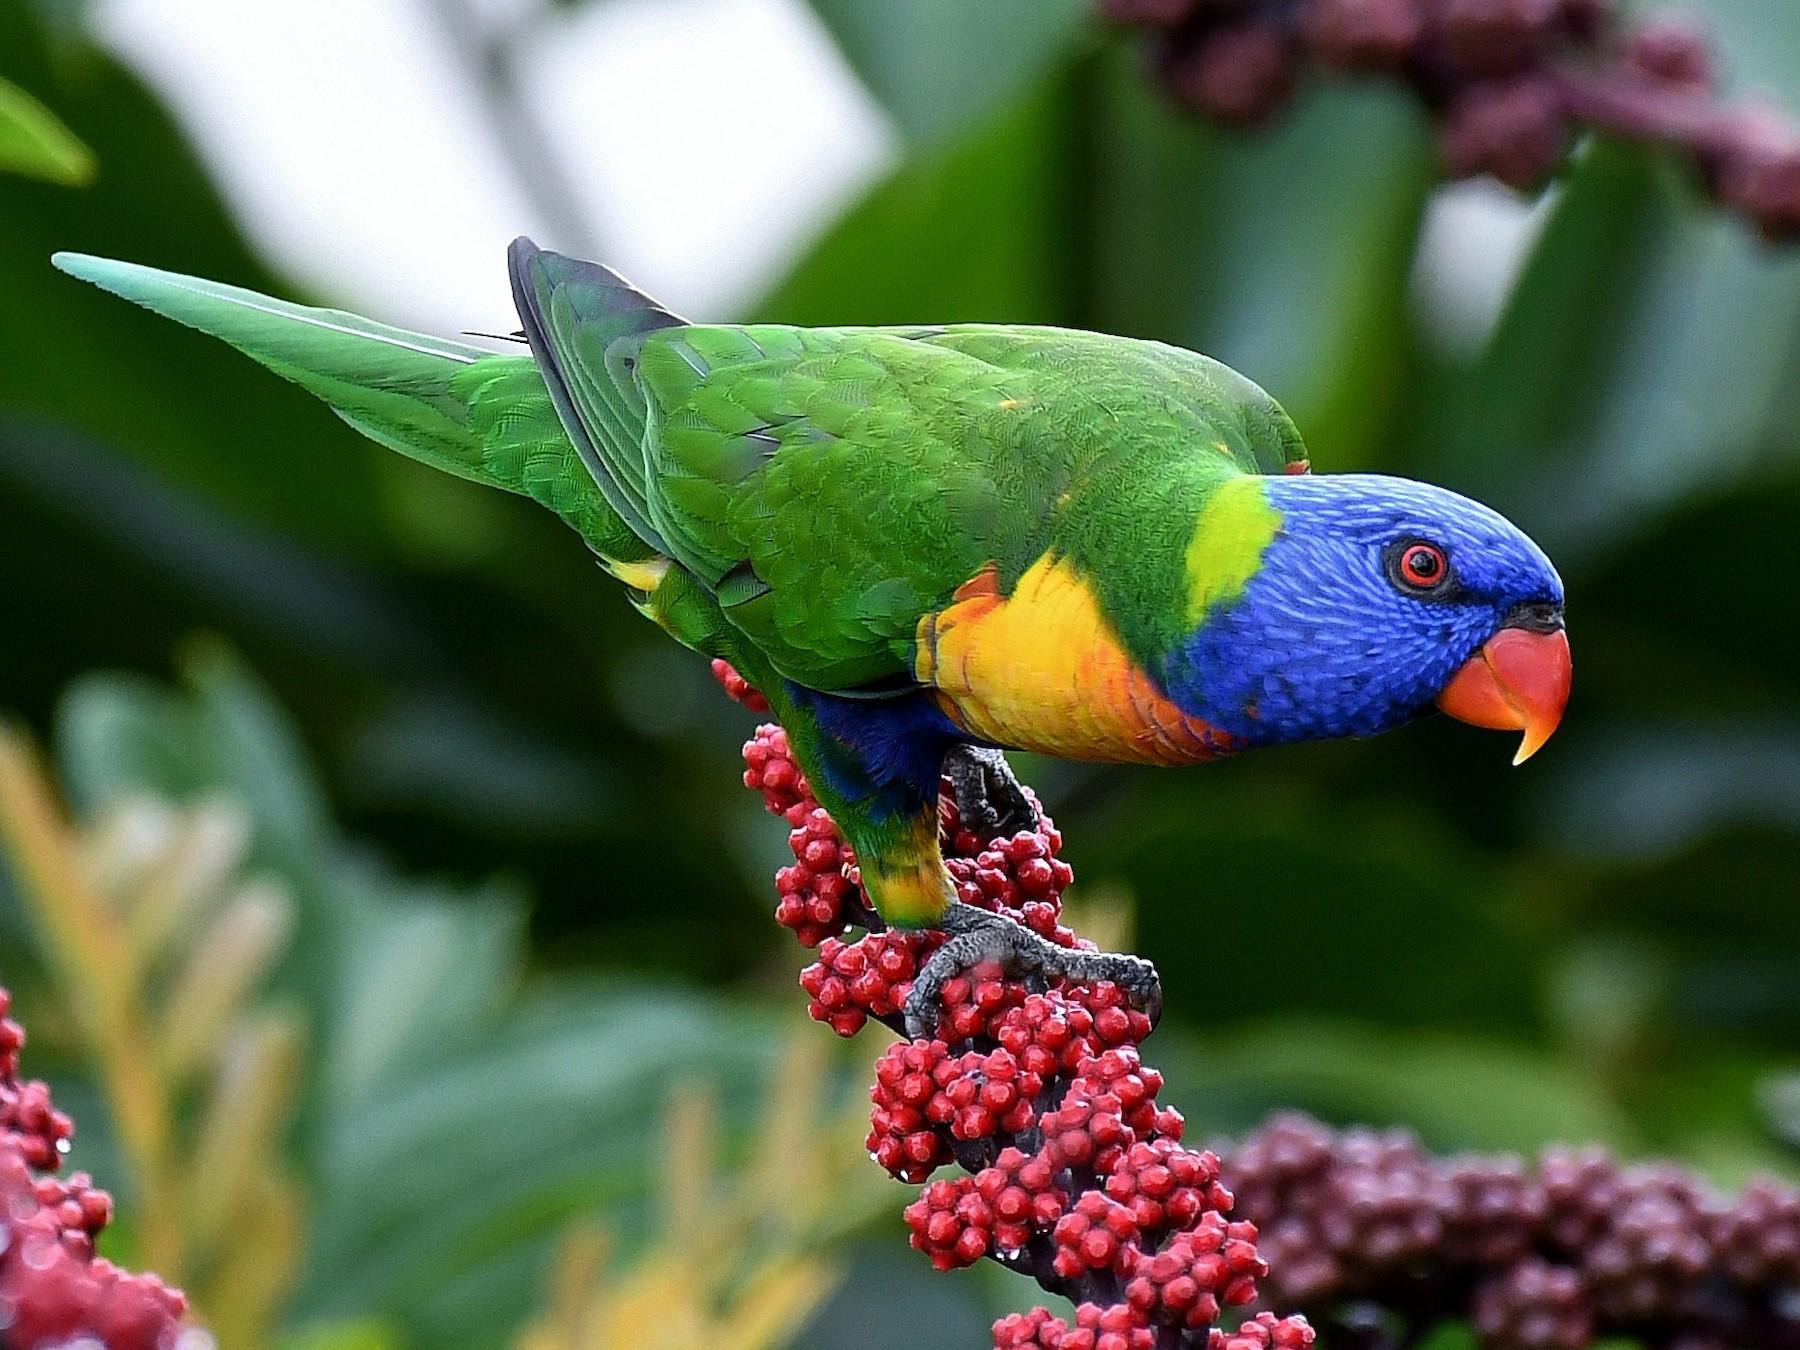 rainbow lorikeet sp. - Terence Alexander